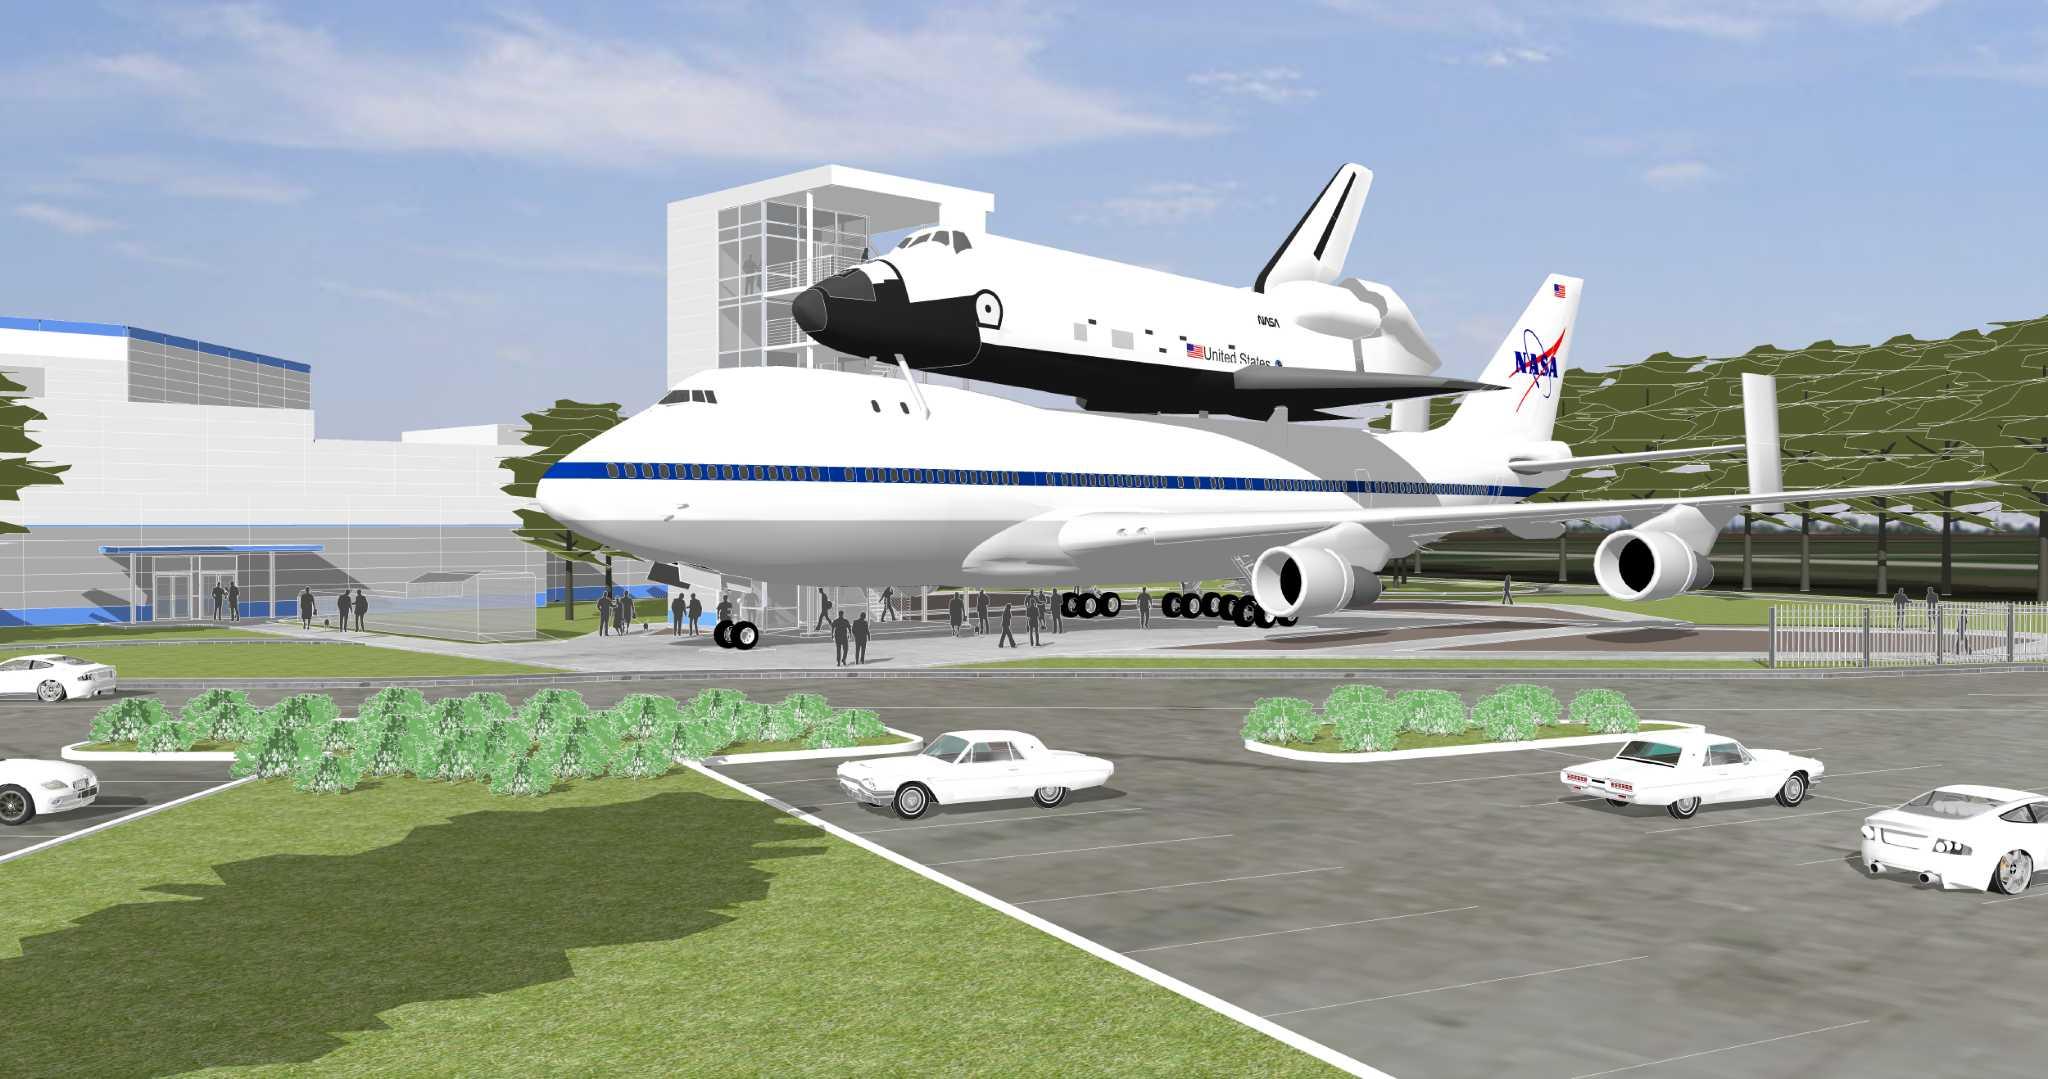 Space Center Houston hoisting shuttle replica onto top of ...